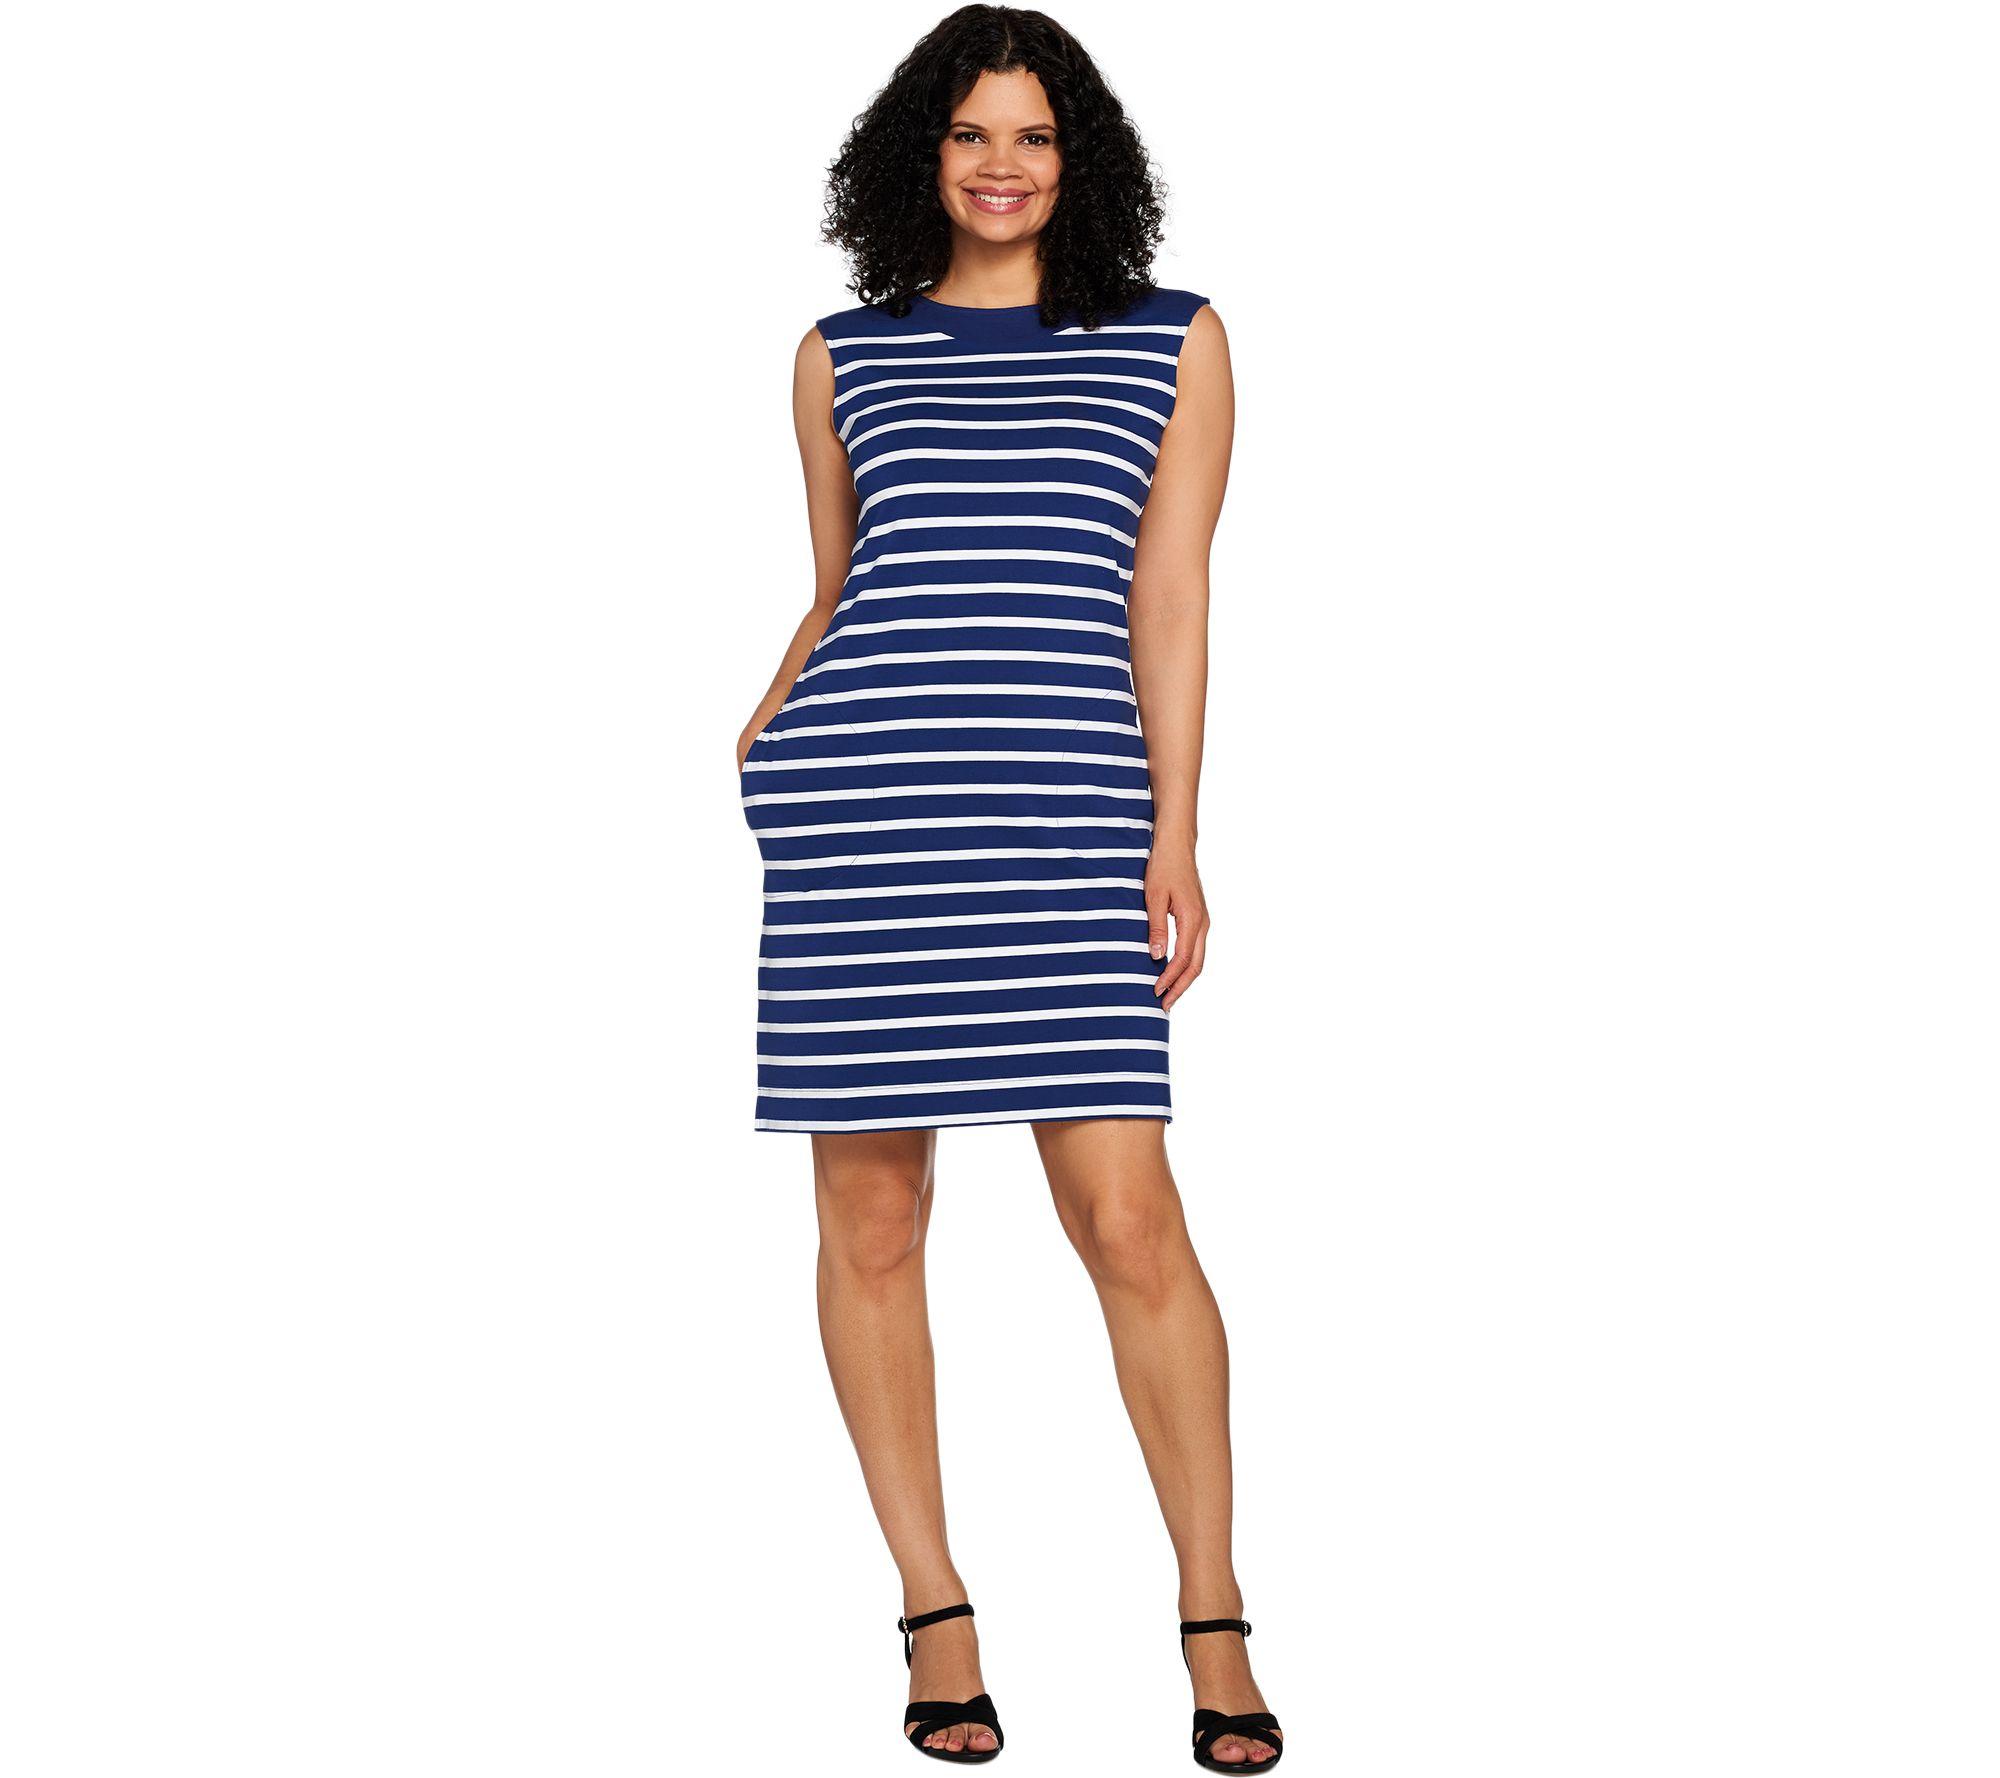 2017 05 fashion jersey dress - Striped Boat Neck Dress A292502